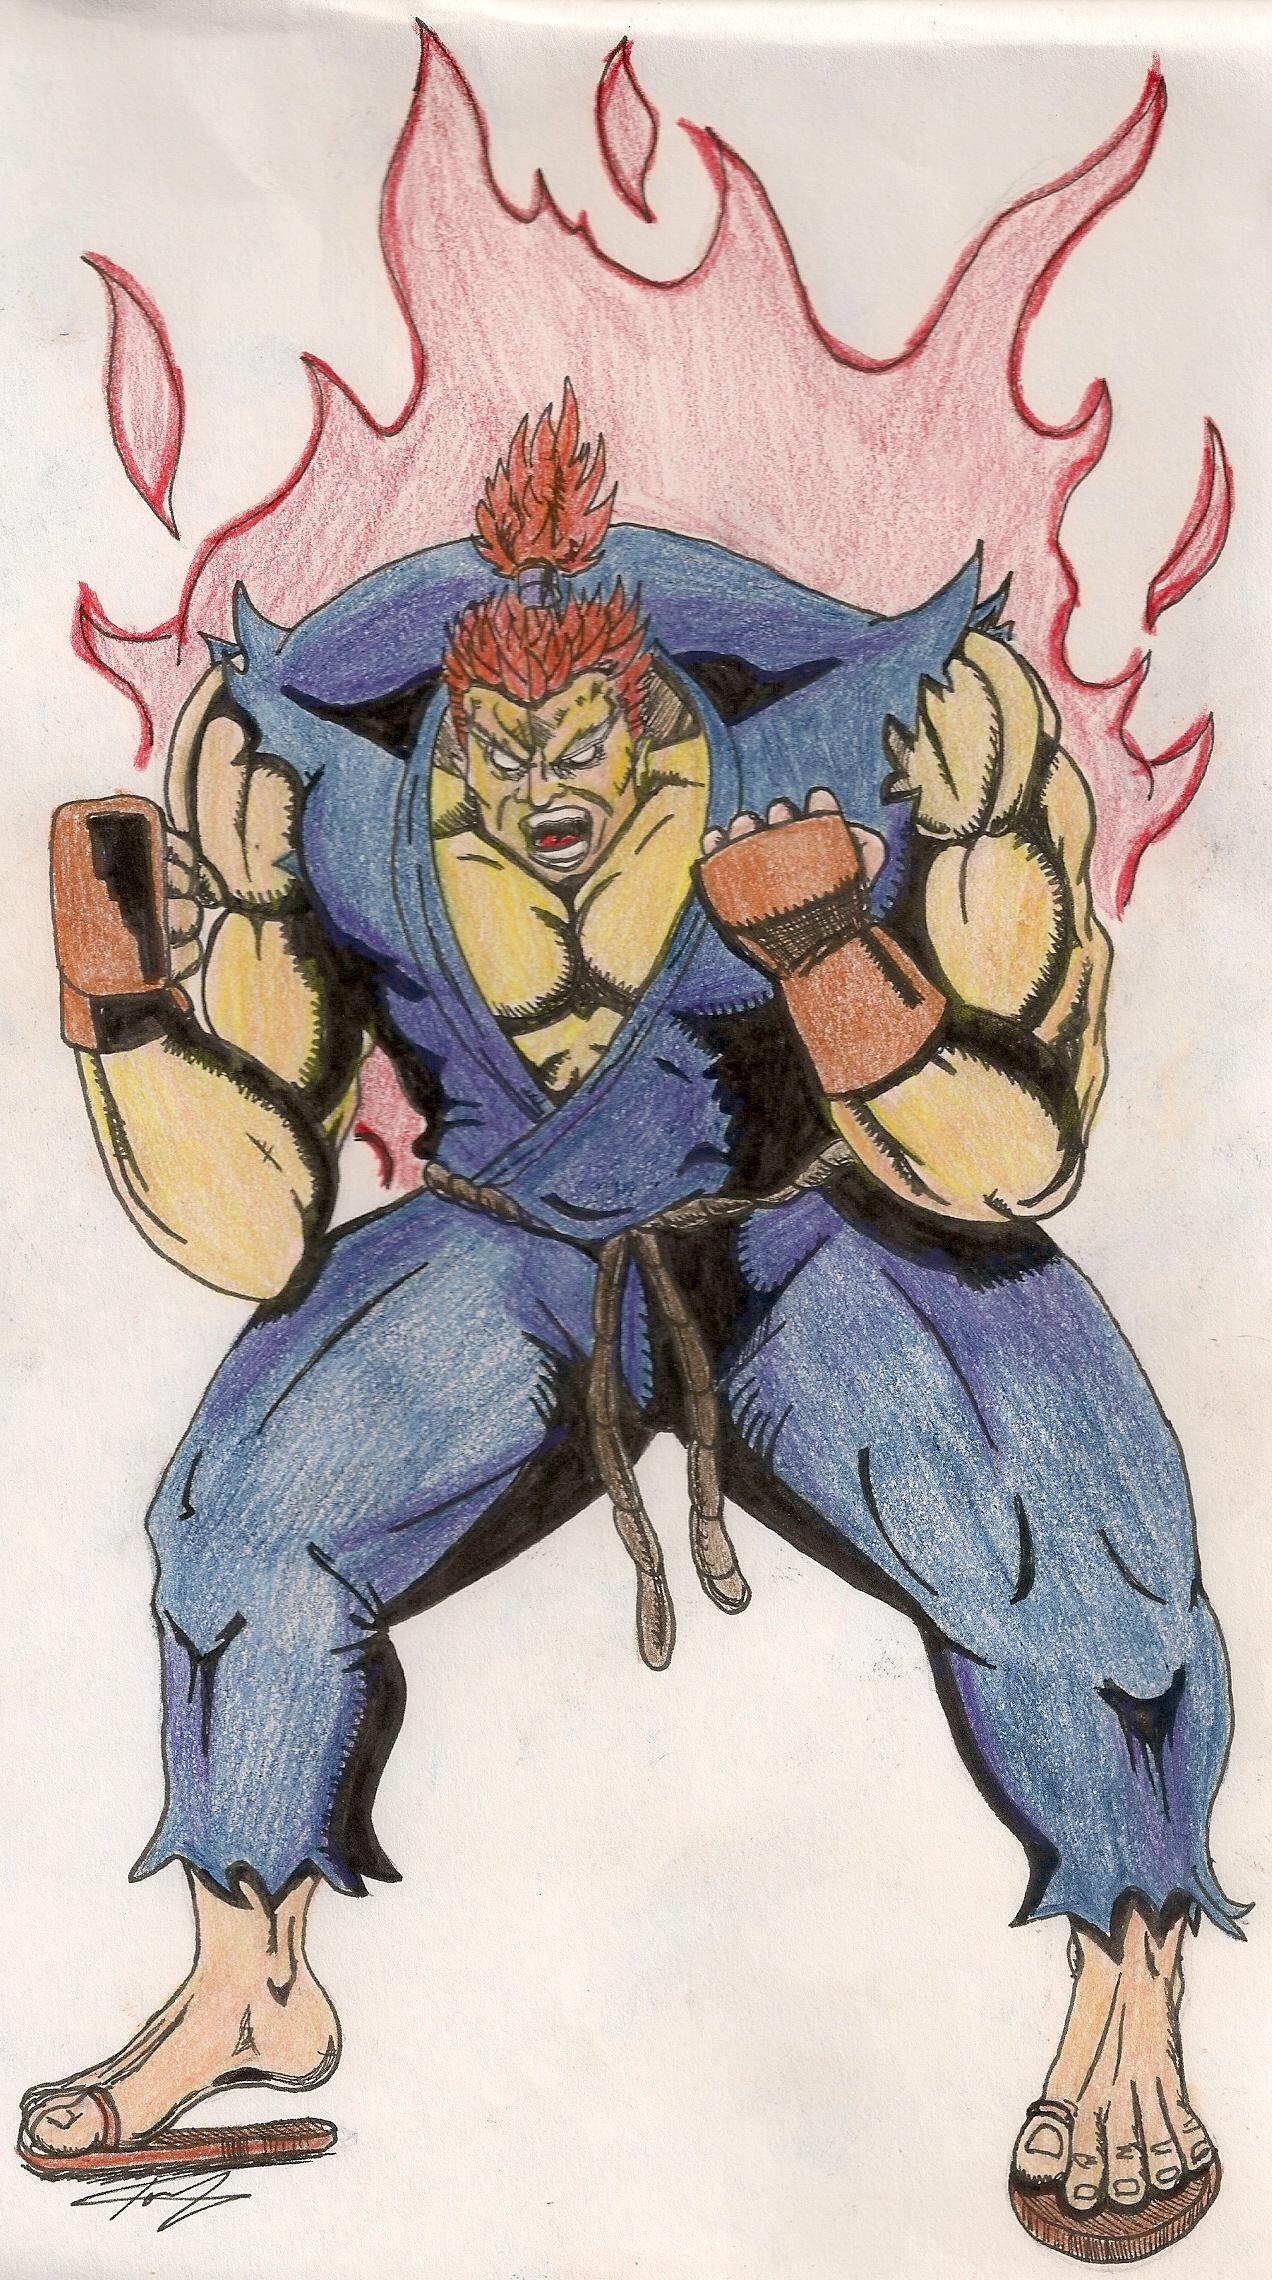 Street Fighter's Akuma